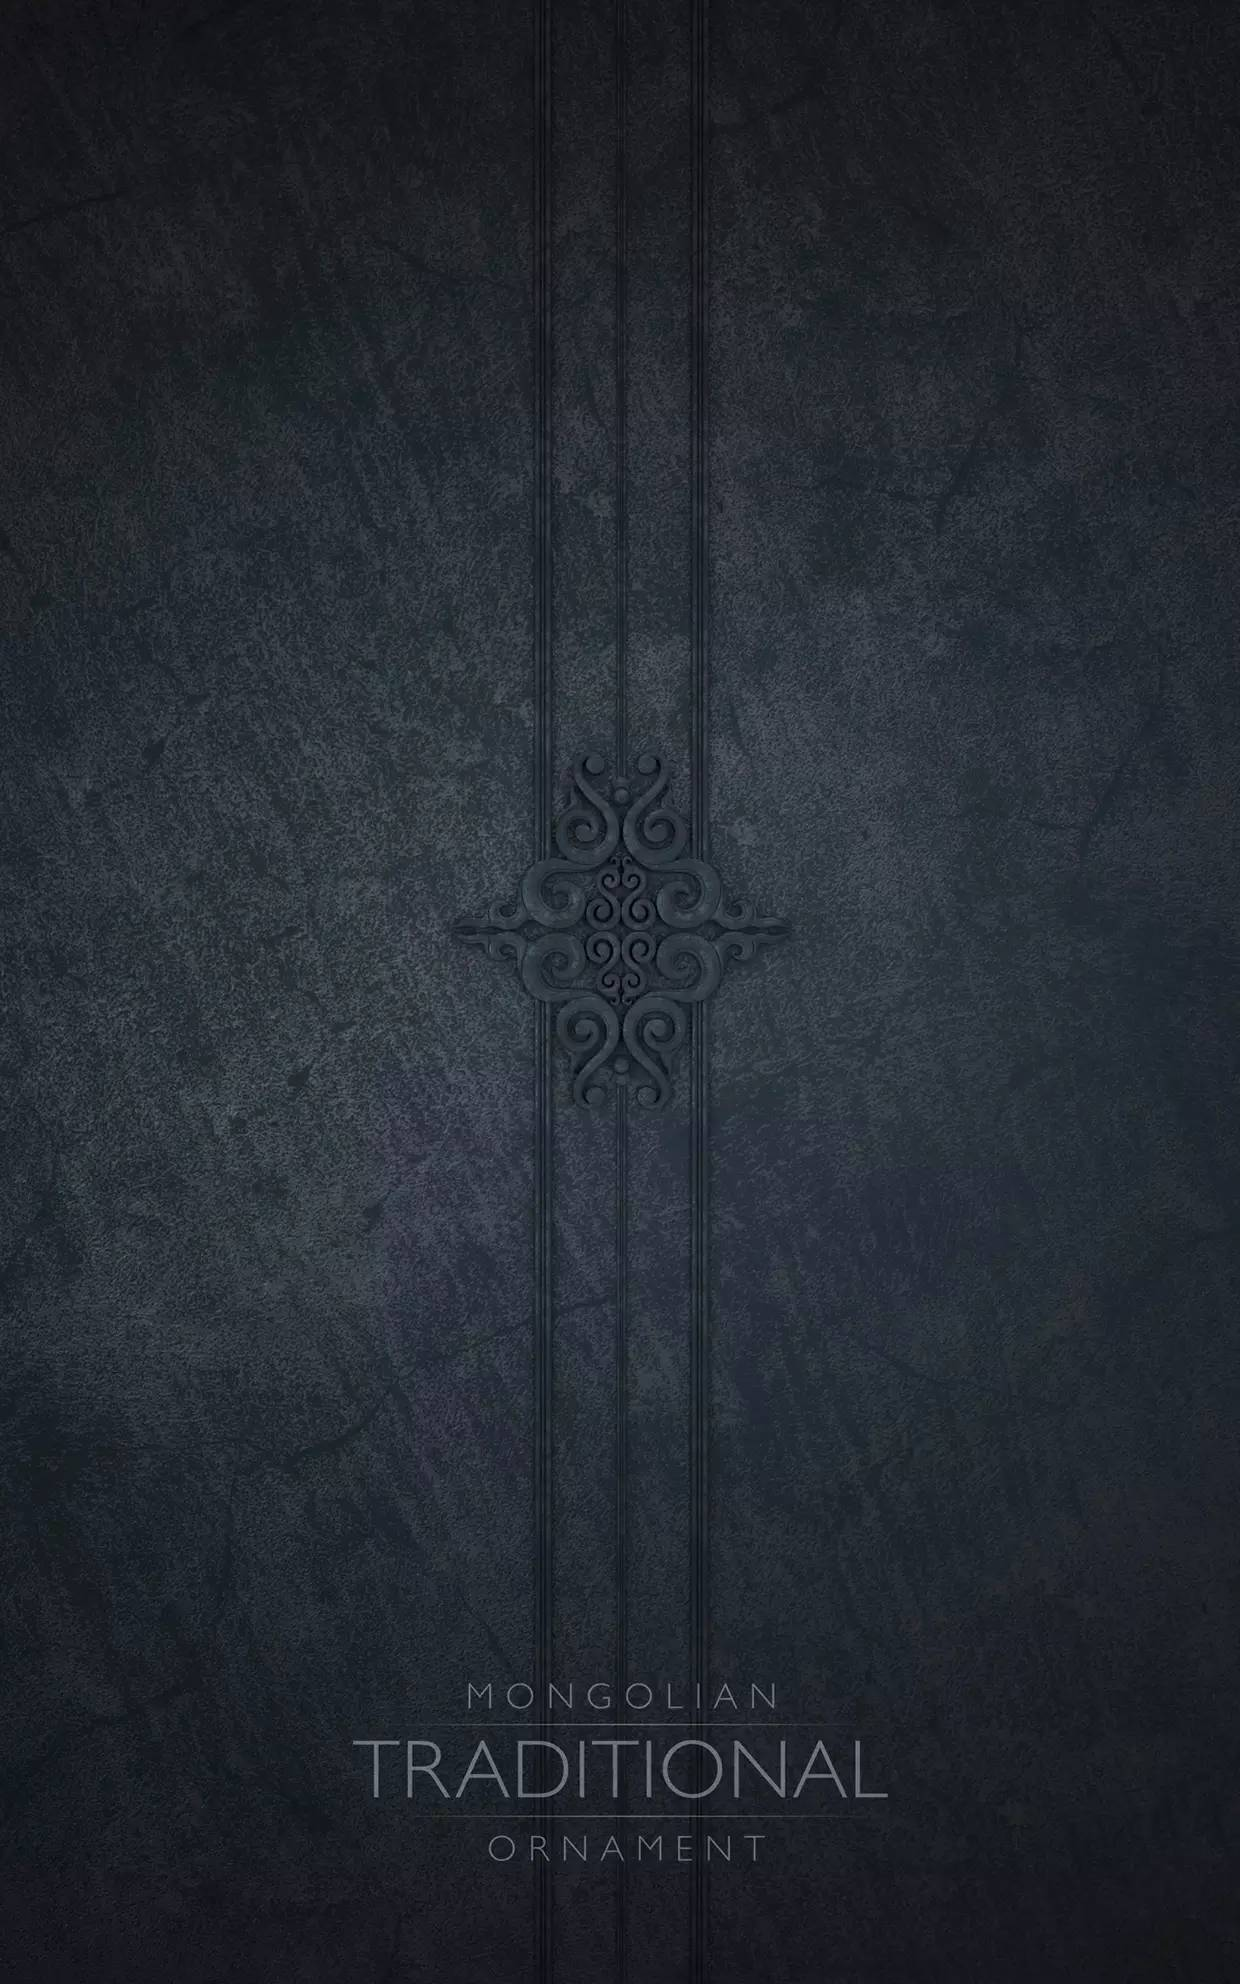 室内设计|蒙族传统装饰(Mongolian Traditional Ornament) 第8张